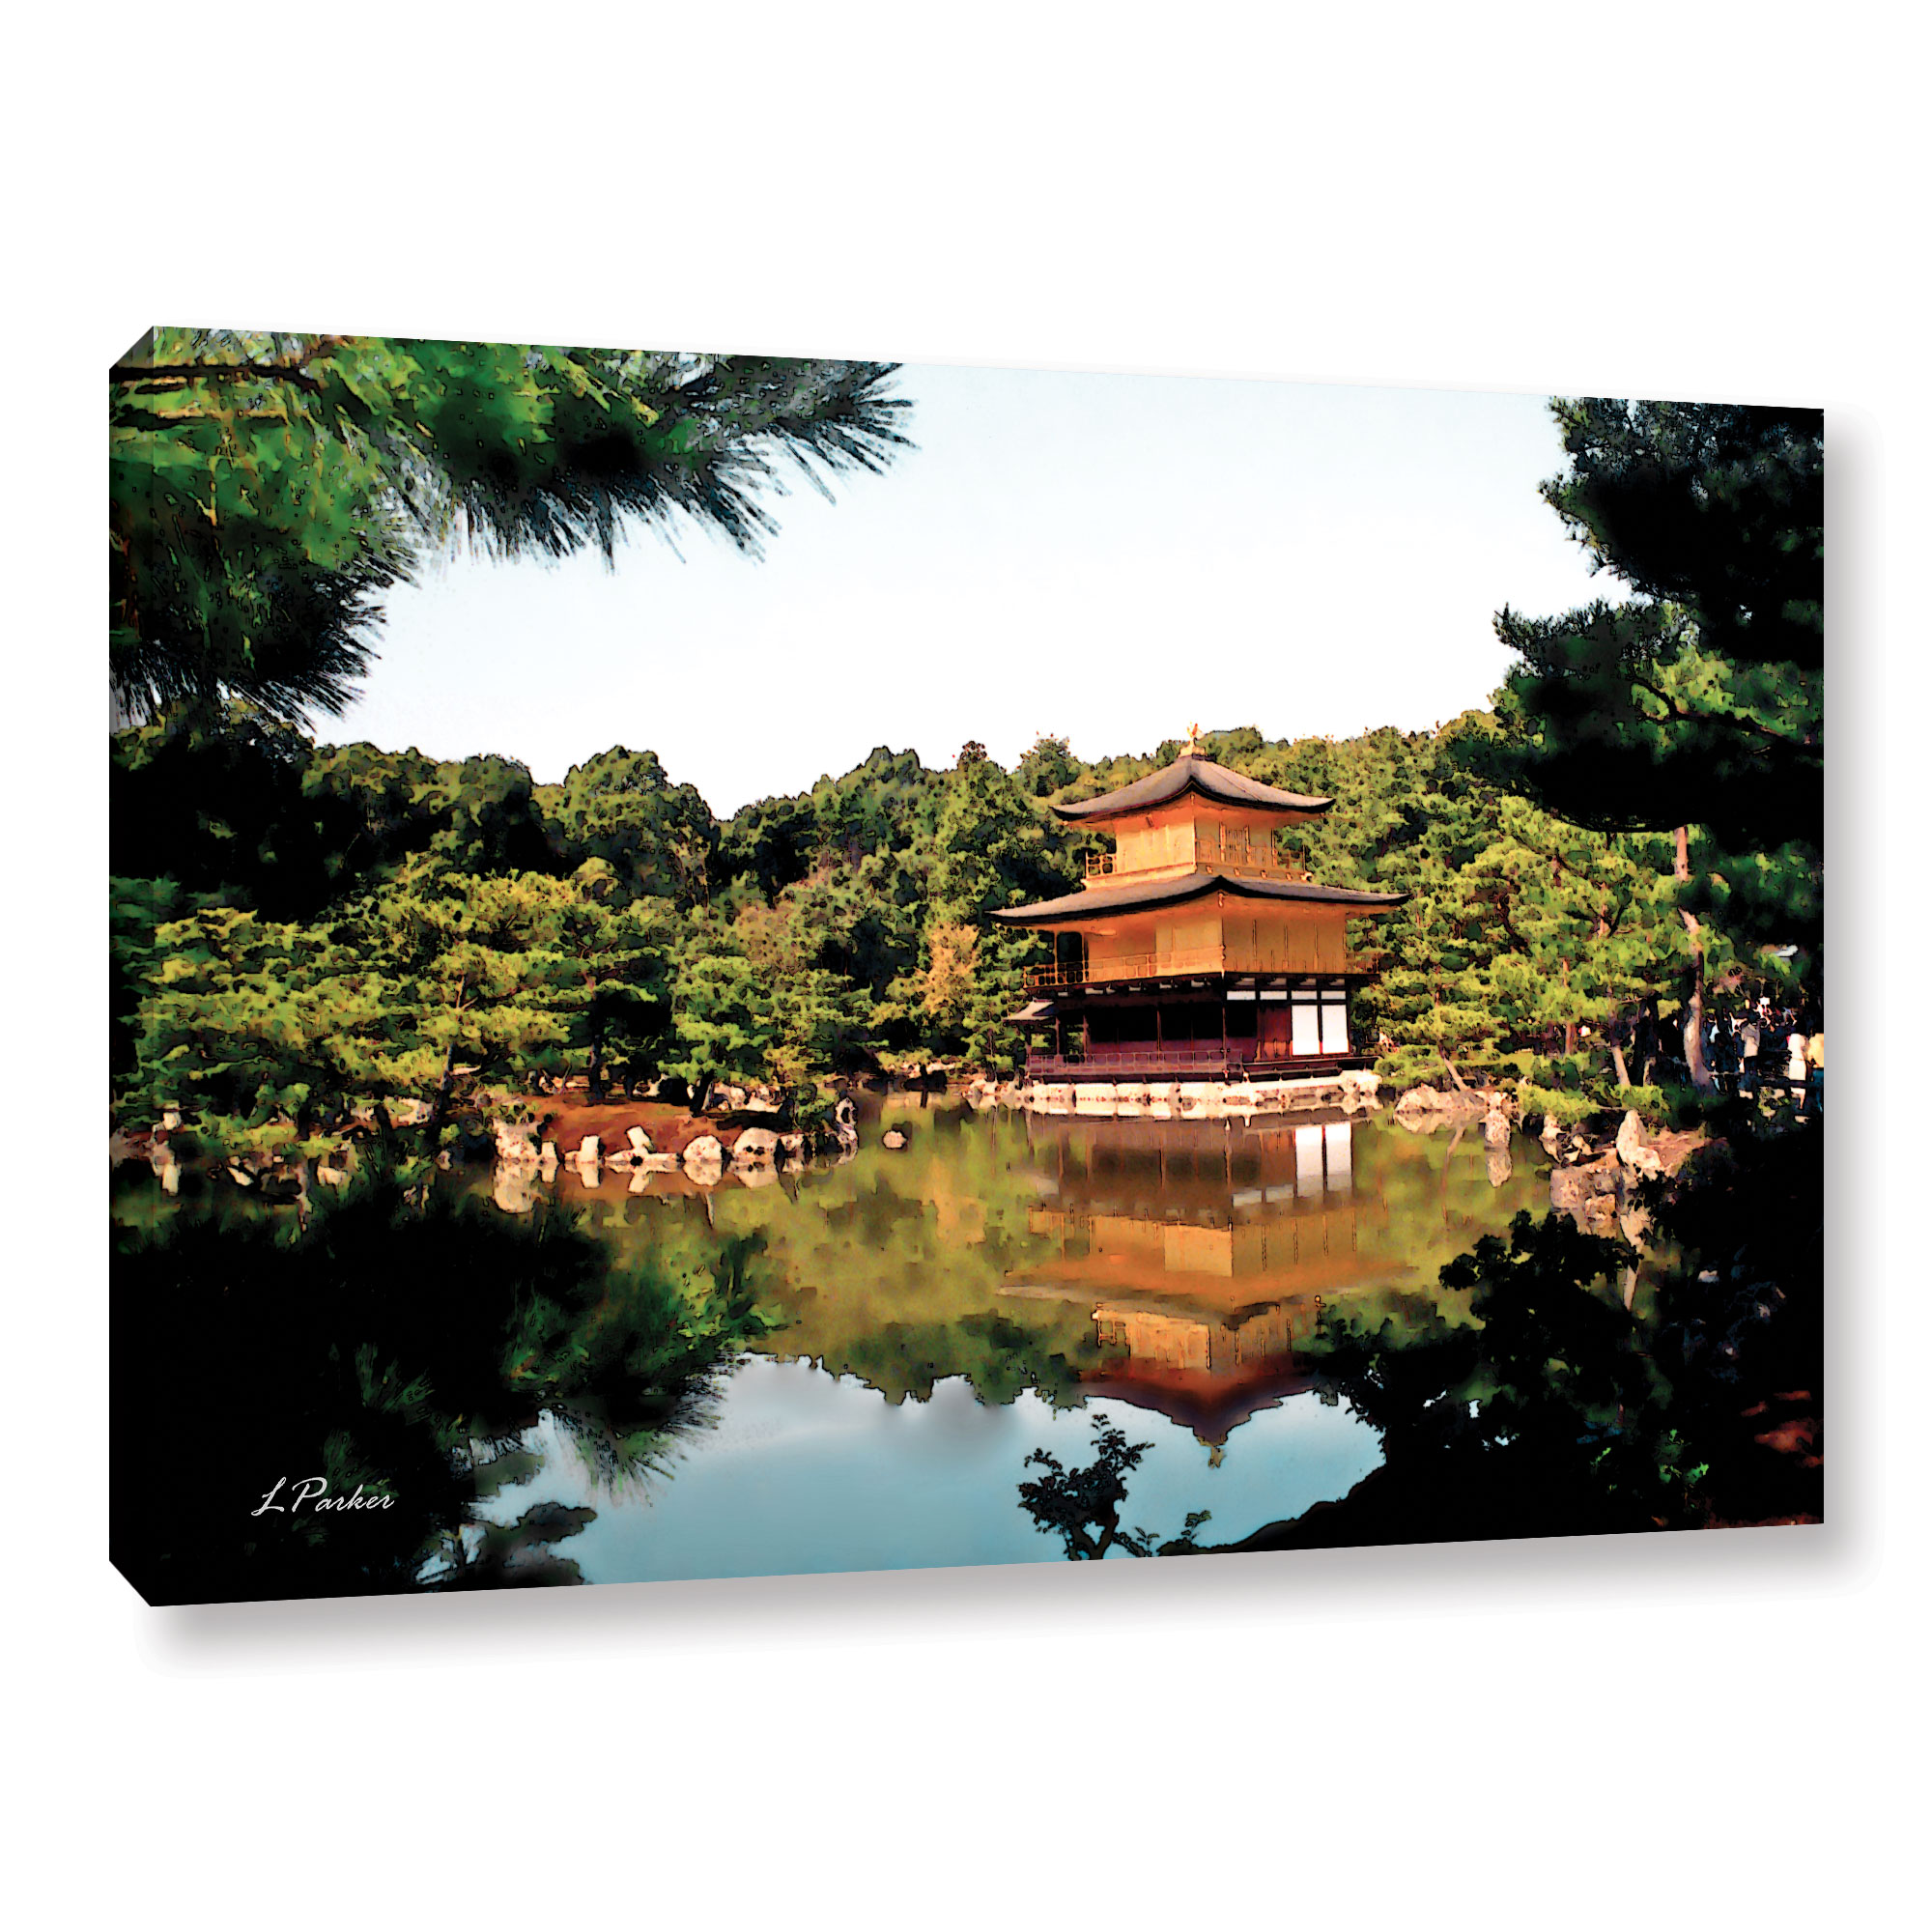 Kinkakuji' Gallery wrapped Canvas Art Print